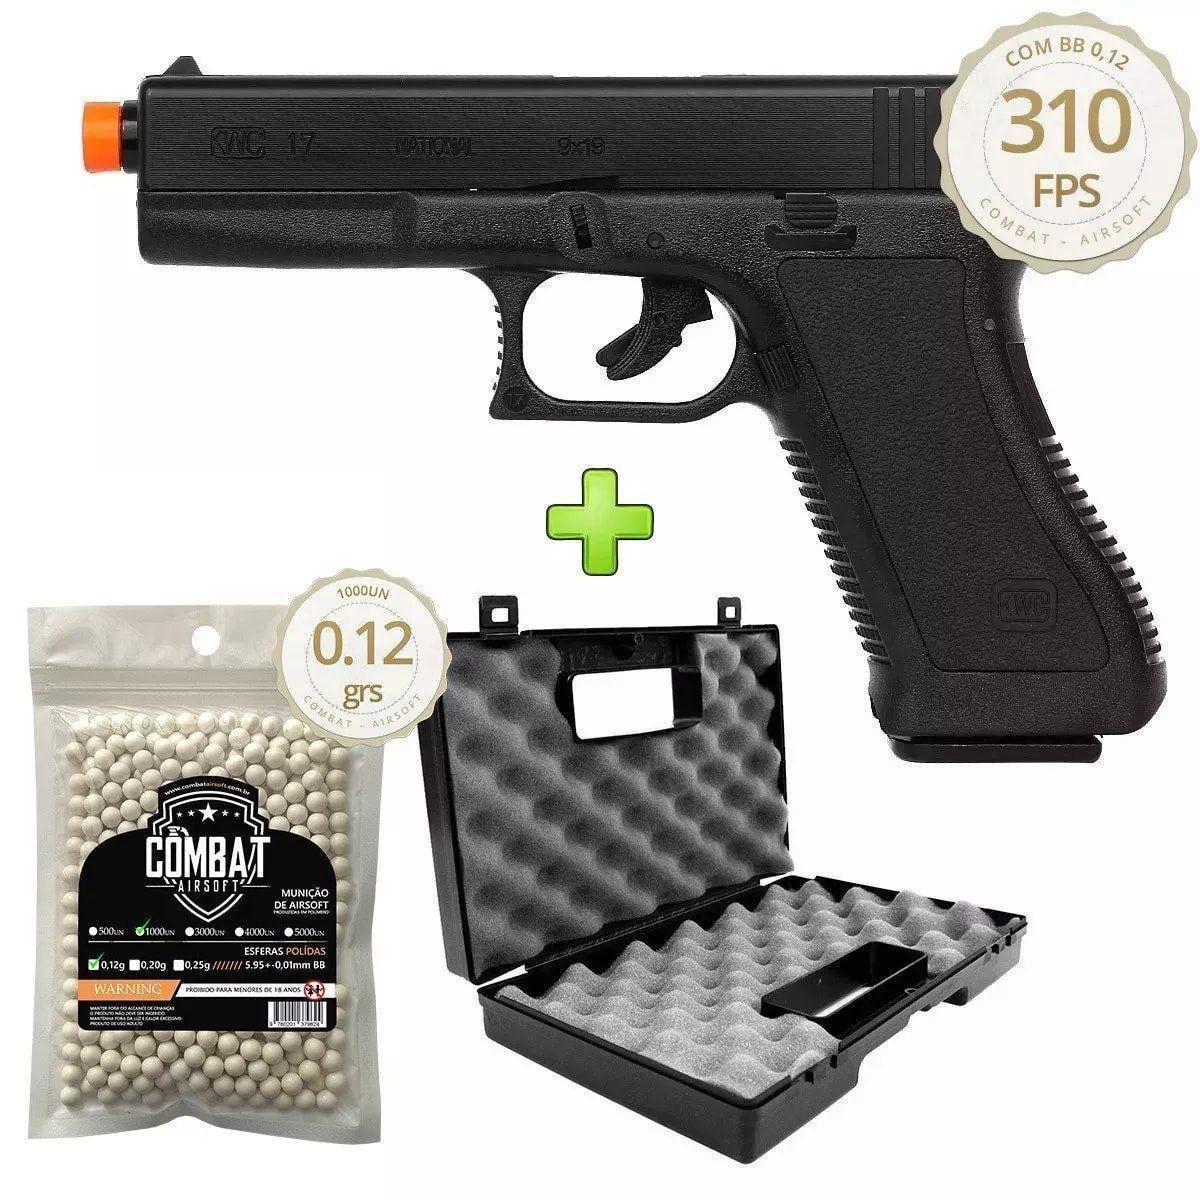 Pistola De Airsoft Spring Kwc Glock G17 + 1000 Bbs + Maleta